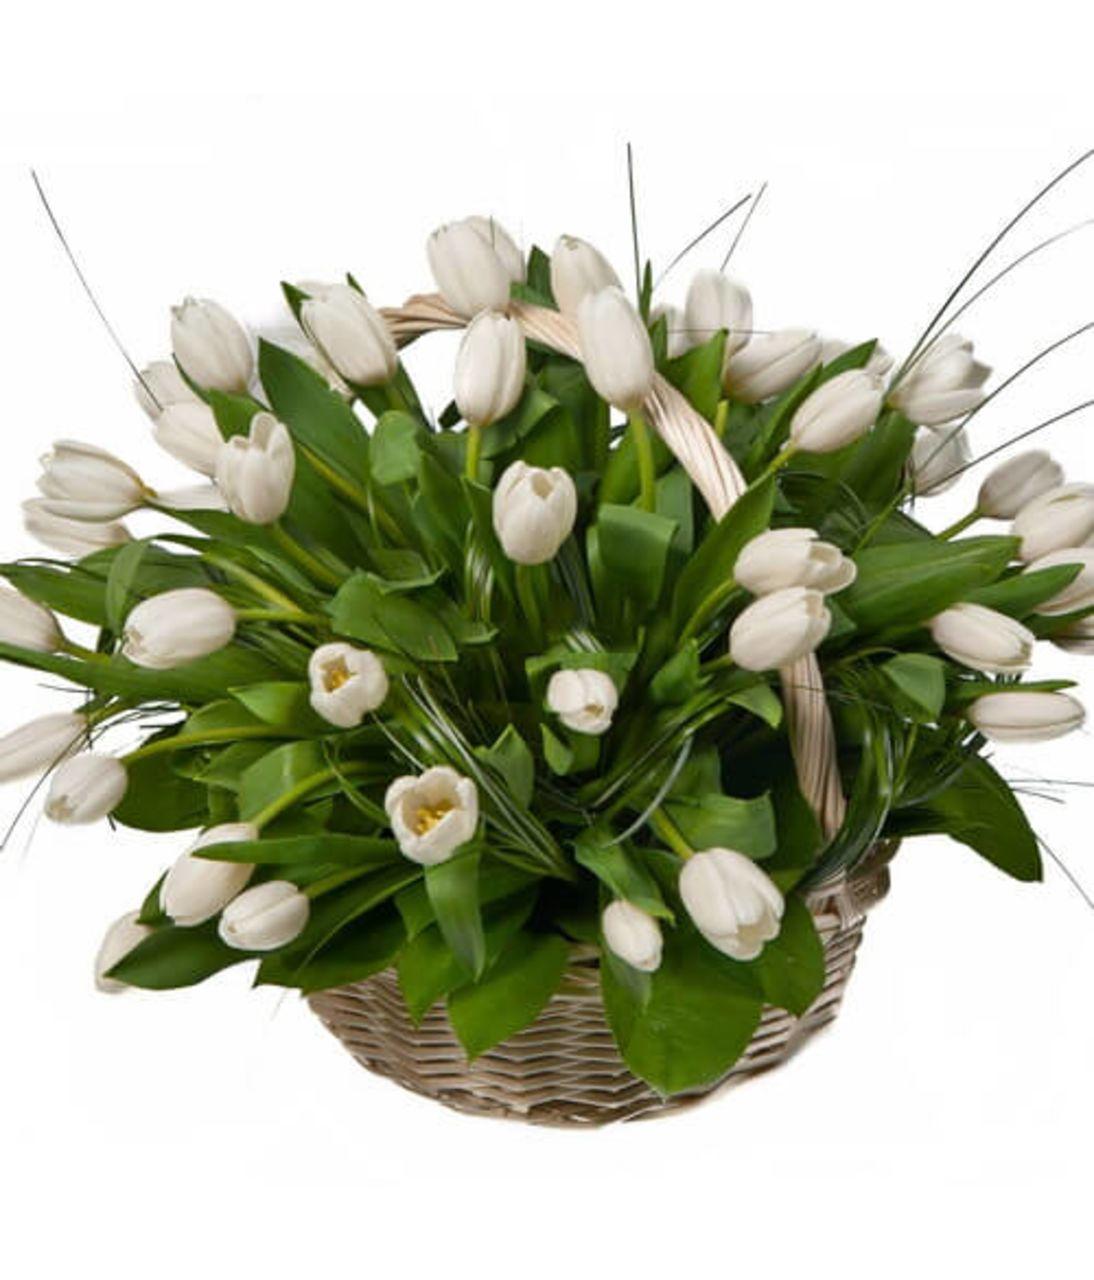 "Корзина белых тюльпанов ""Белое облако"". Superflowers.com.ua"